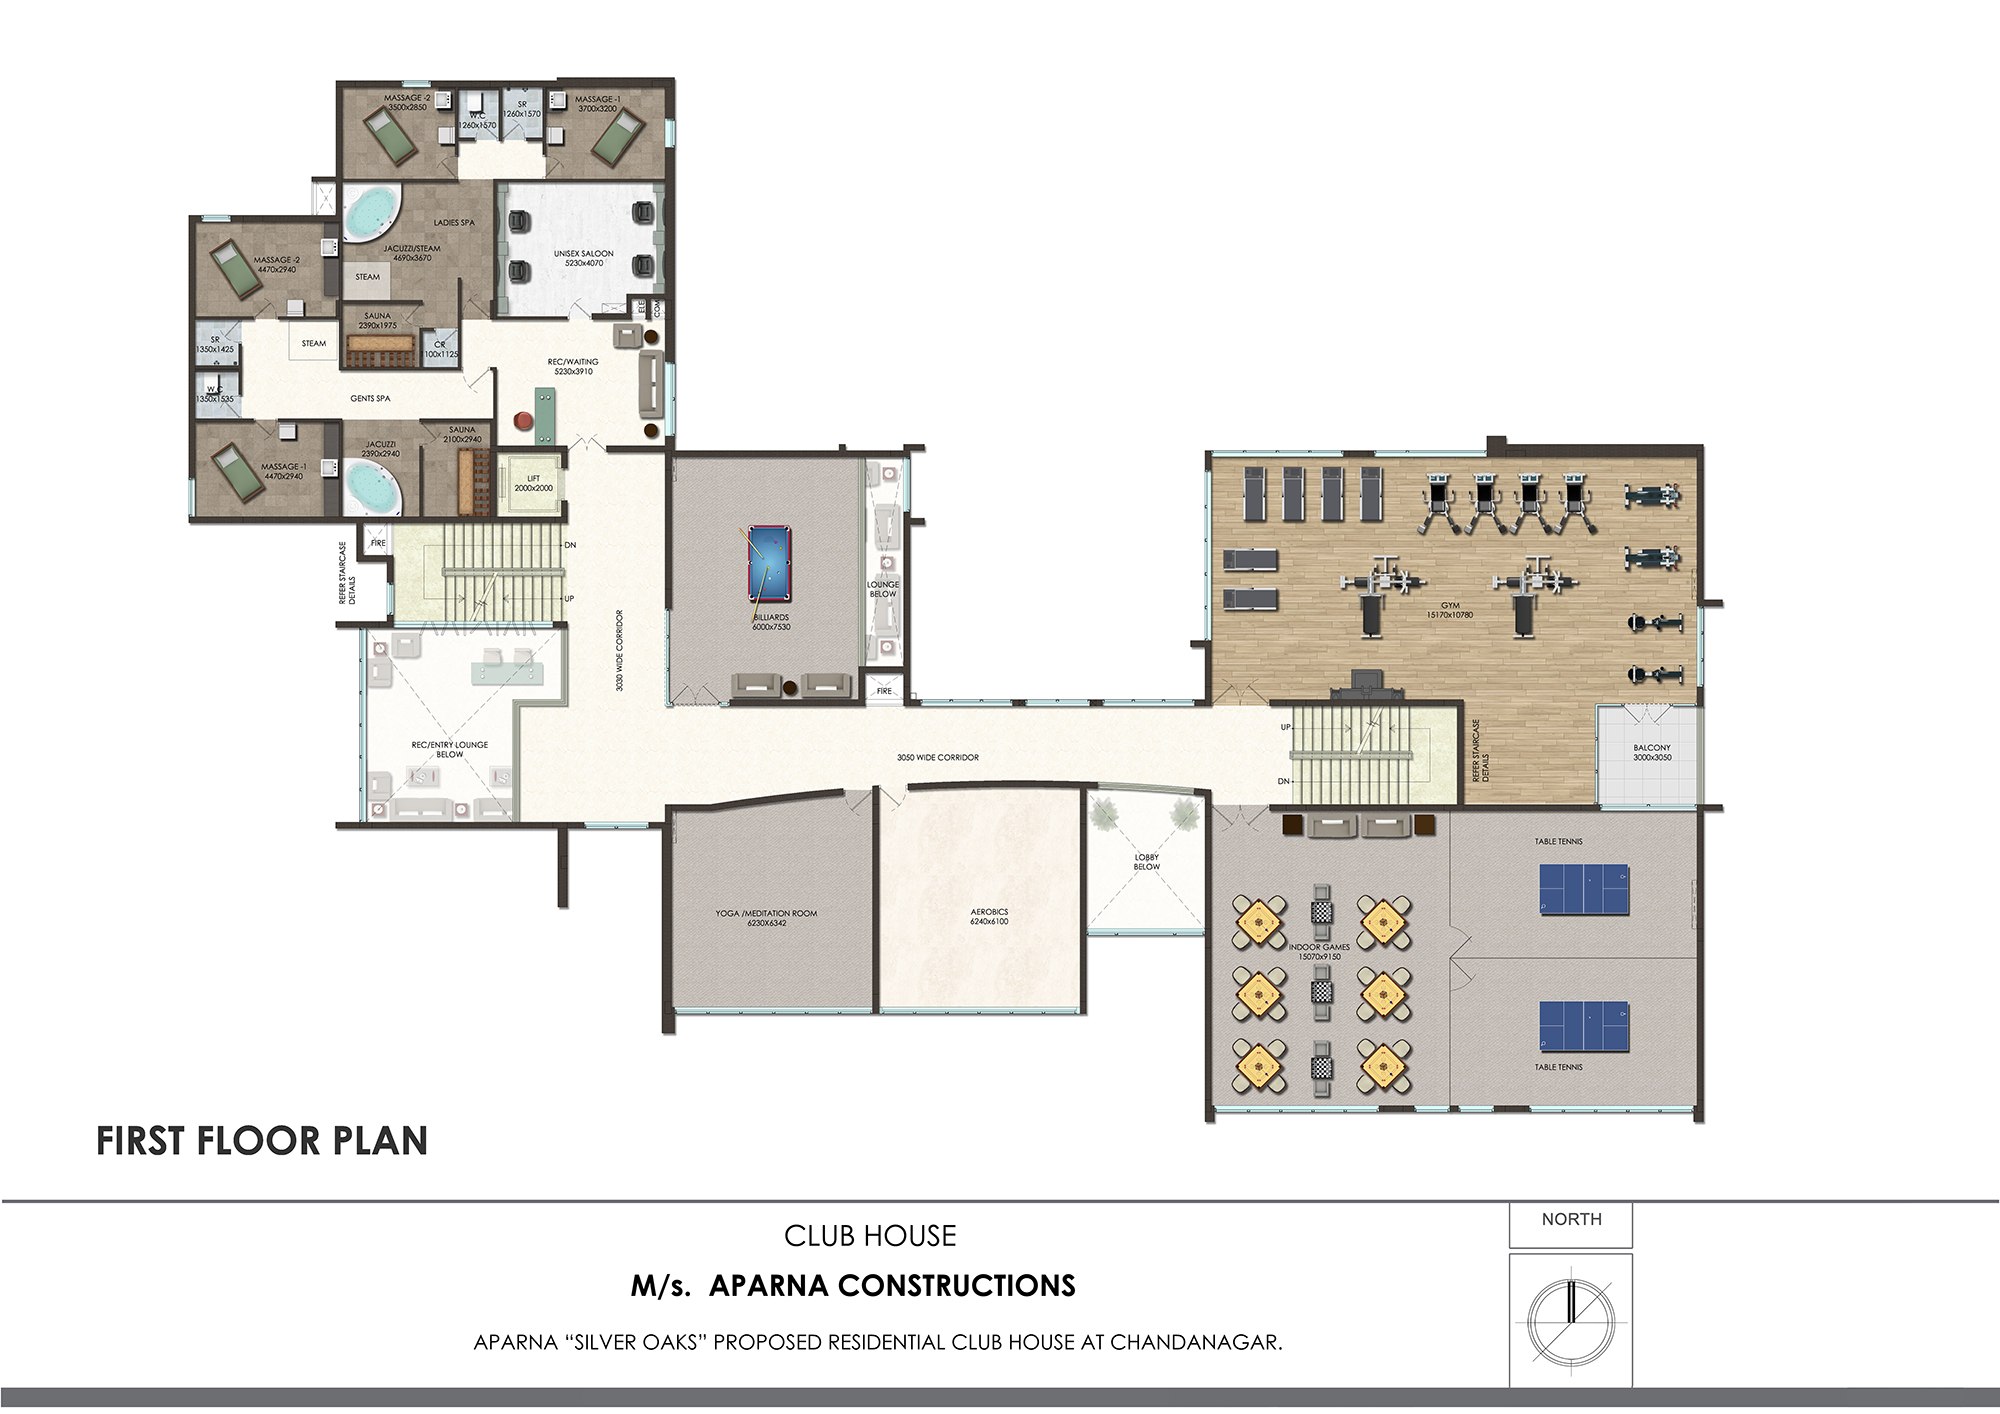 Apartments for sale in Chandanagar | Aparna HillPark Silver Oaks